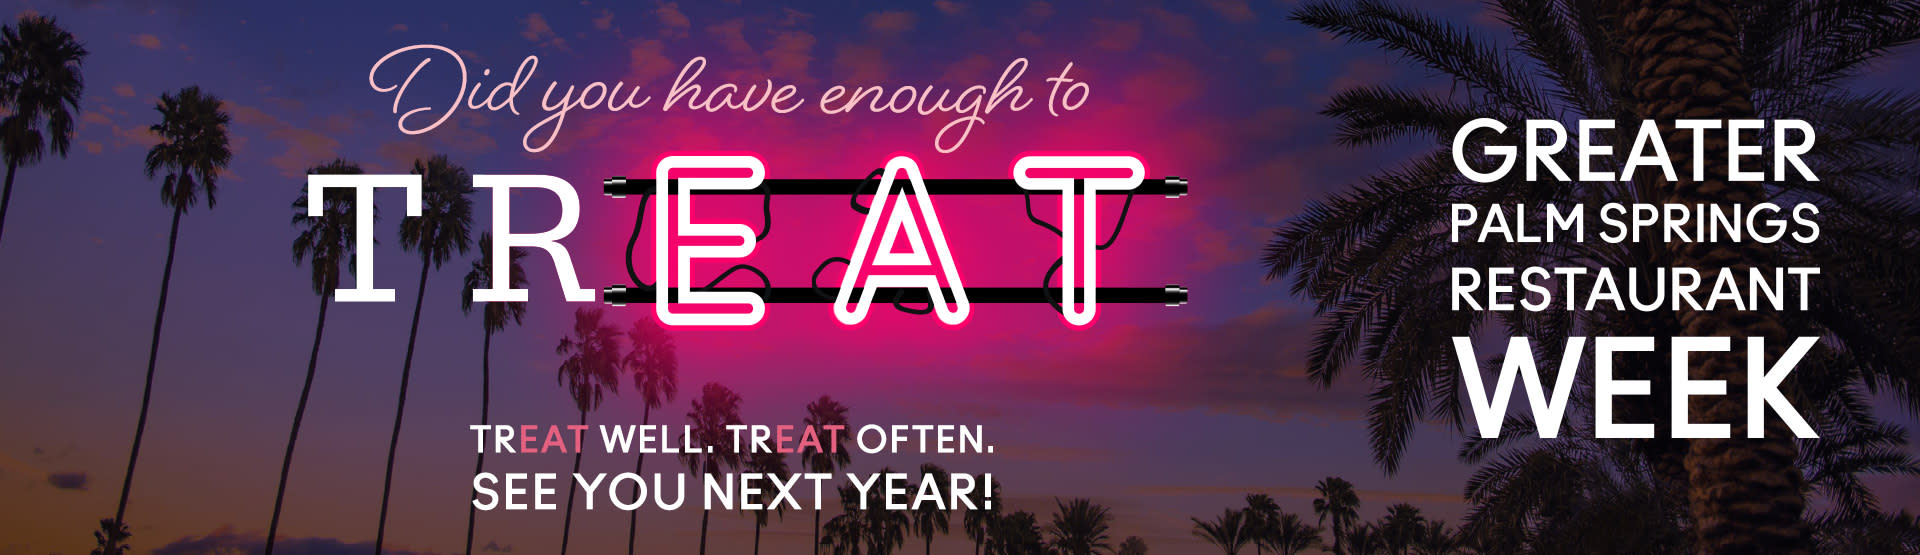 Denver Restaurant Week 2020 List.Search Menus For Greater Palm Springs Restaurant Week May 31